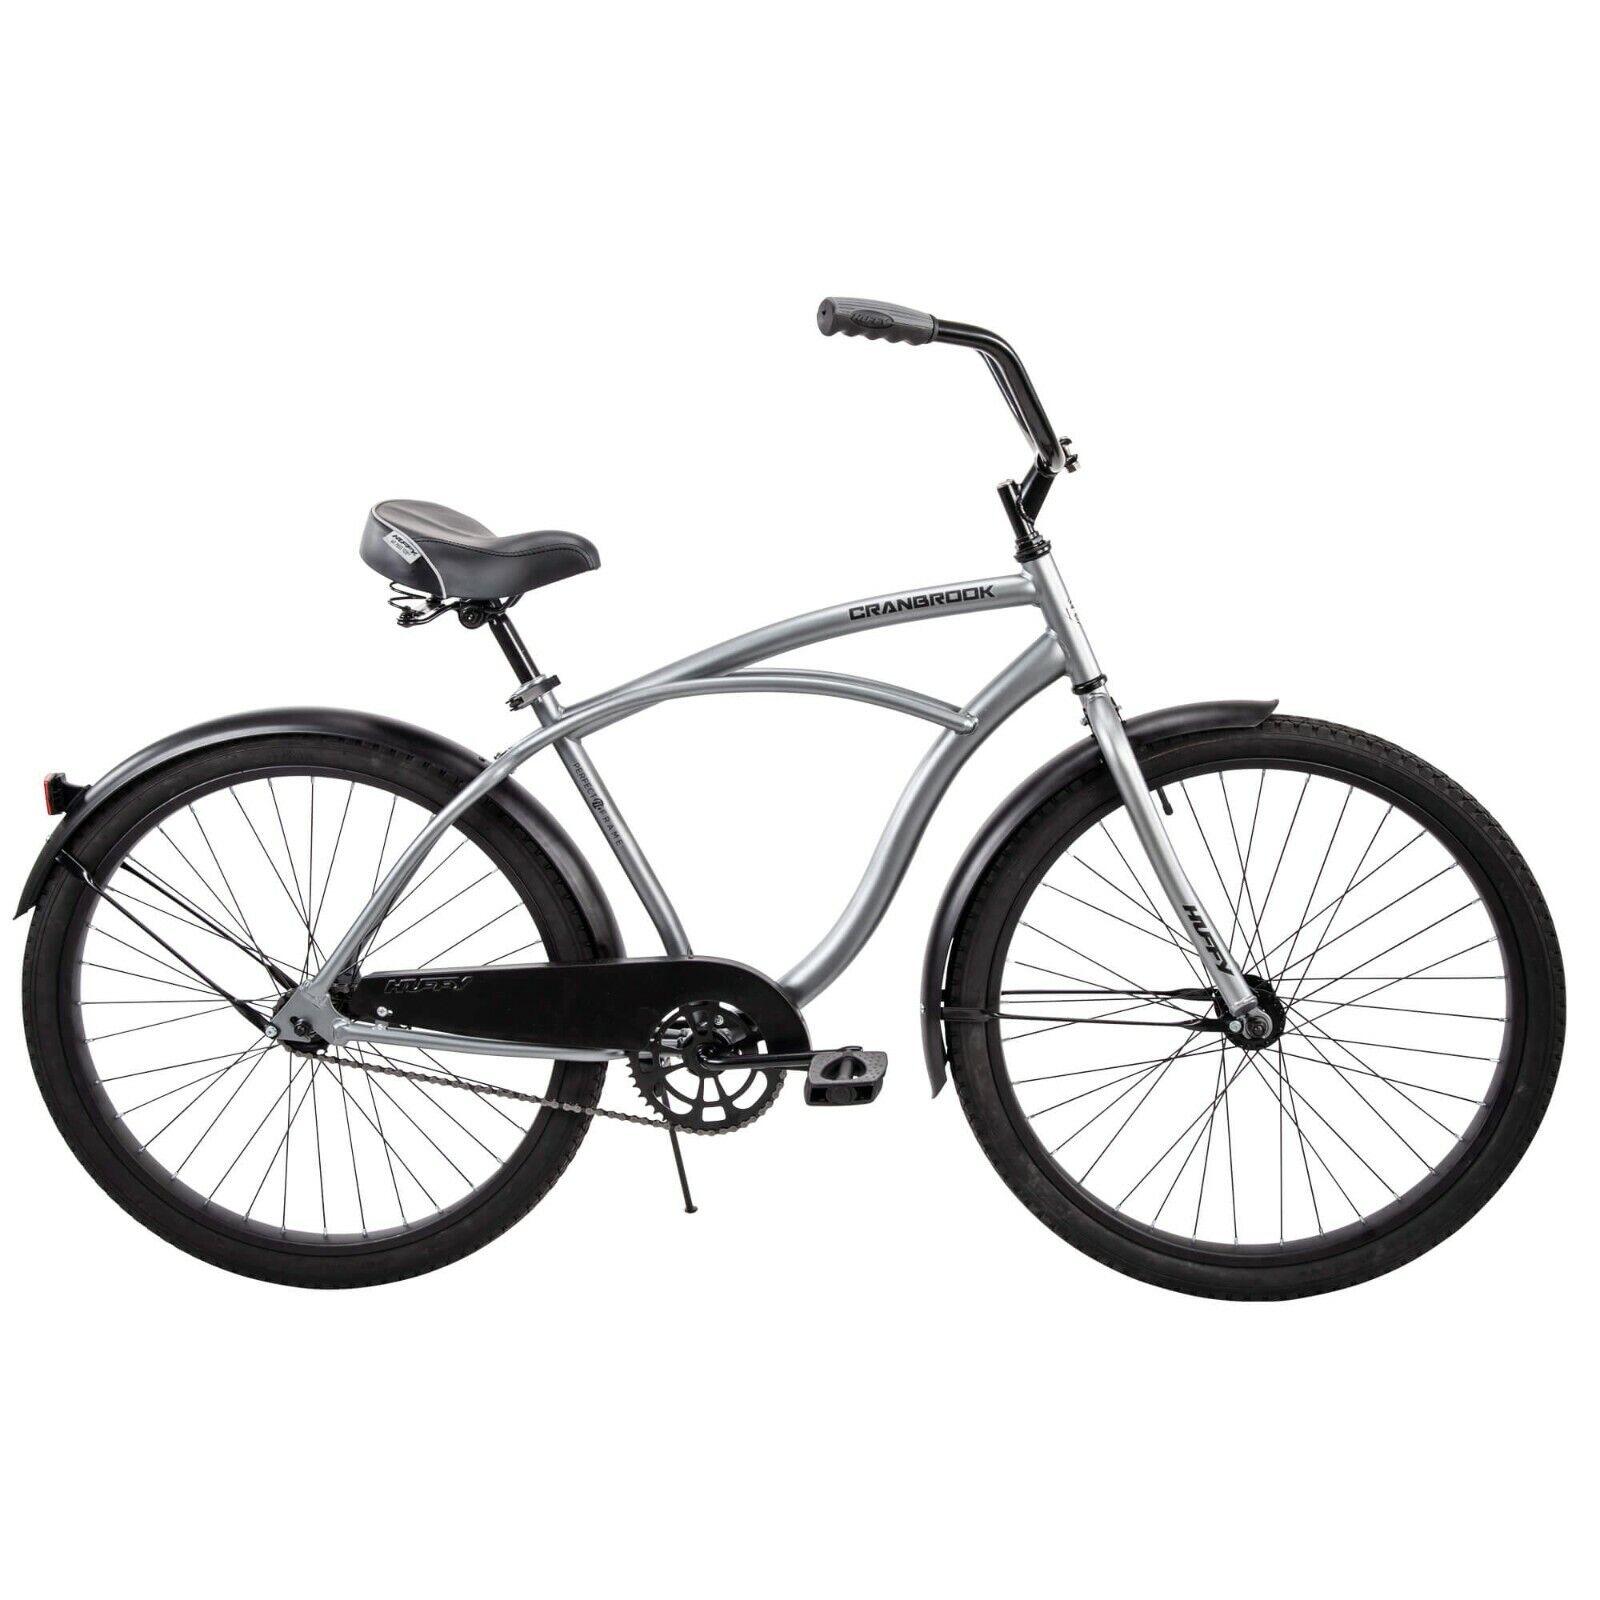 "Huffy 26"" Cranbrook Men's Beach Cruiser Comfort Bike, Silver"